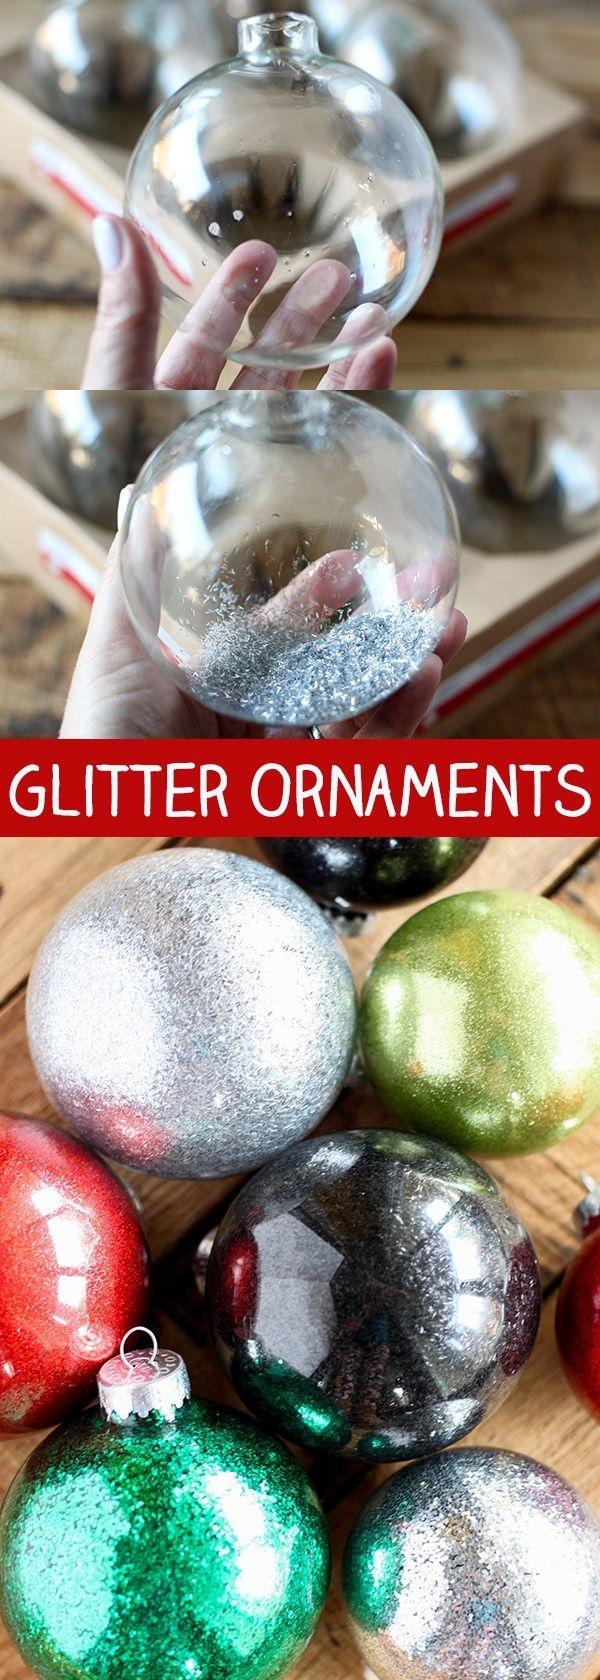 Simple Crafty Diy Christmas Crafts Ideas On A Budget 27